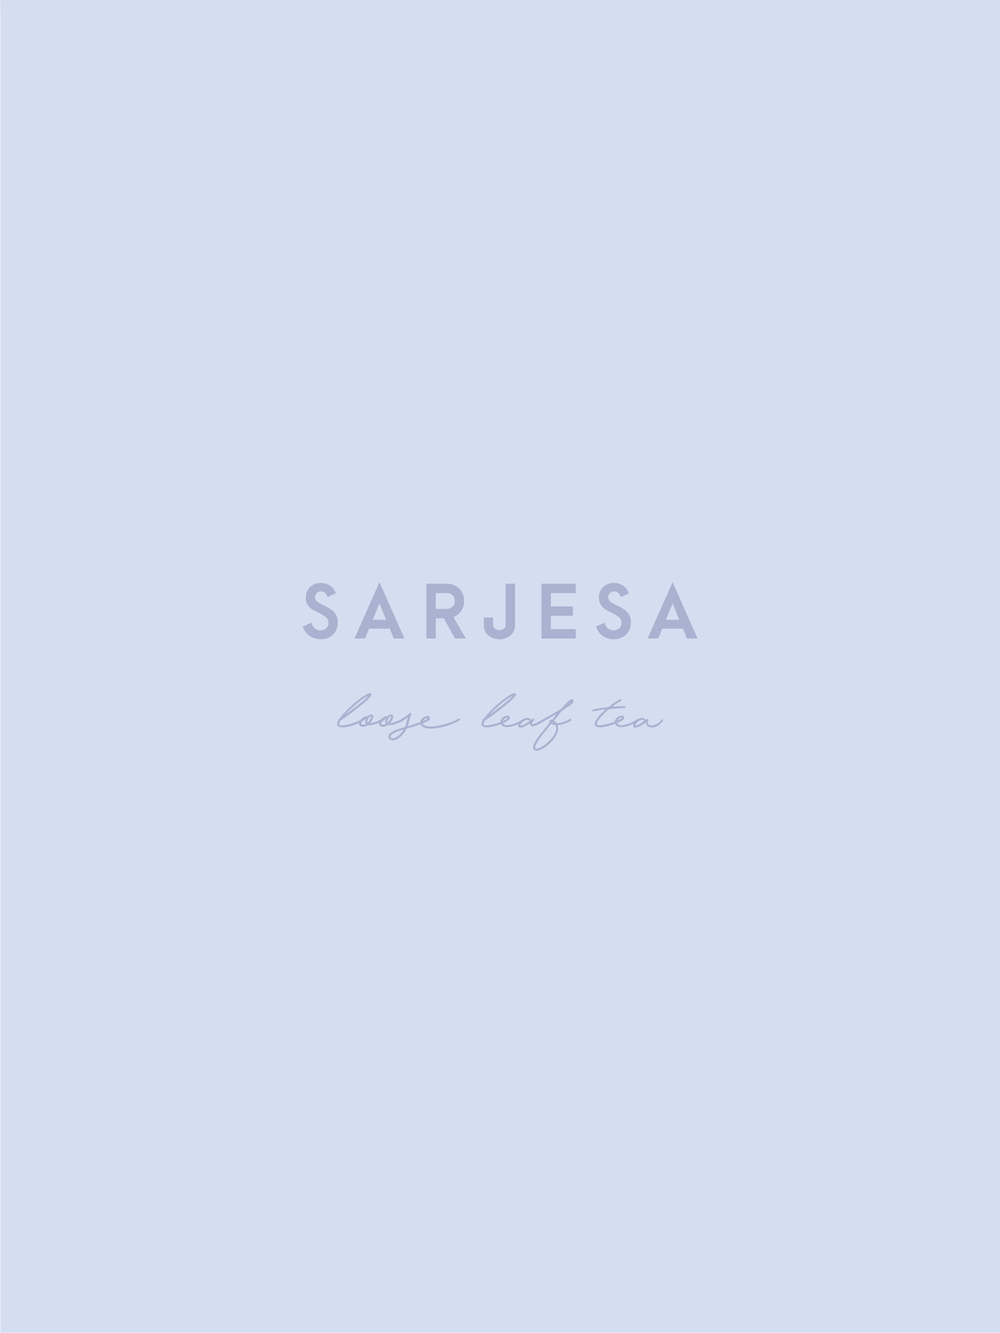 Sarjesa Logo | Trout + Taylor www.troutandtaylor.com